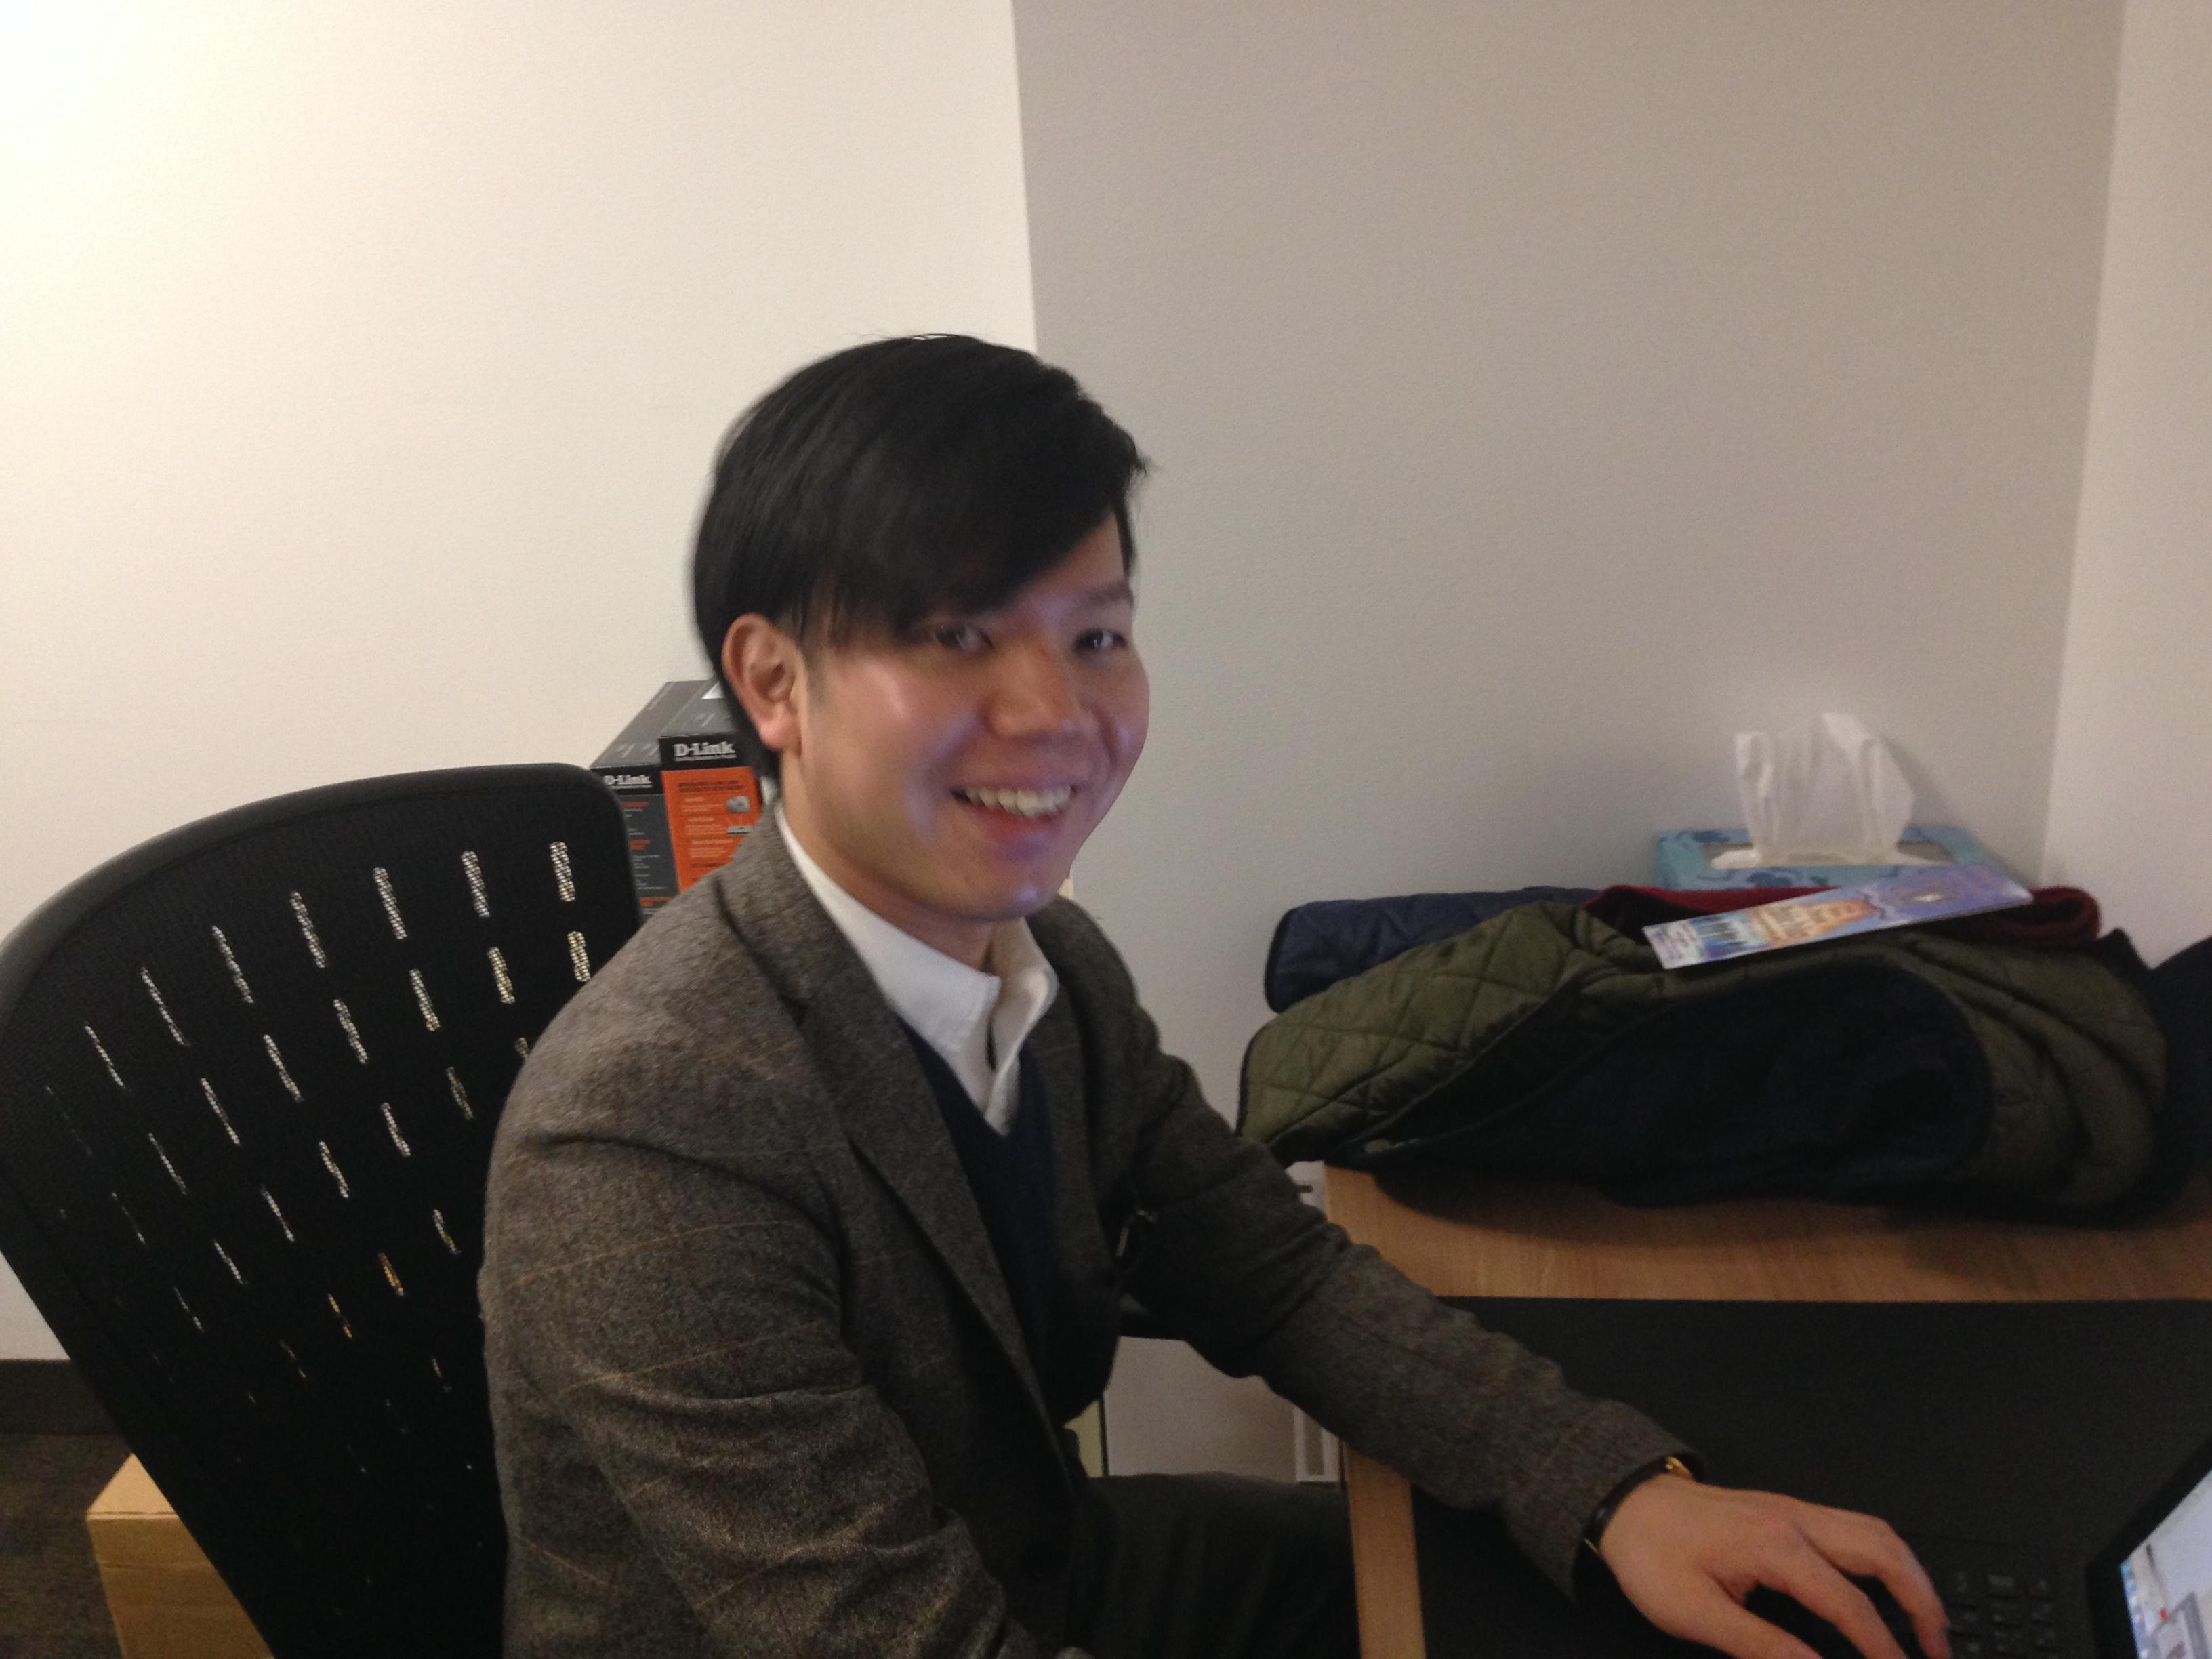 Hiroto Sawada, Graduate Student from Keio University, Japan on internship at Center for Media & Peace Initiatives